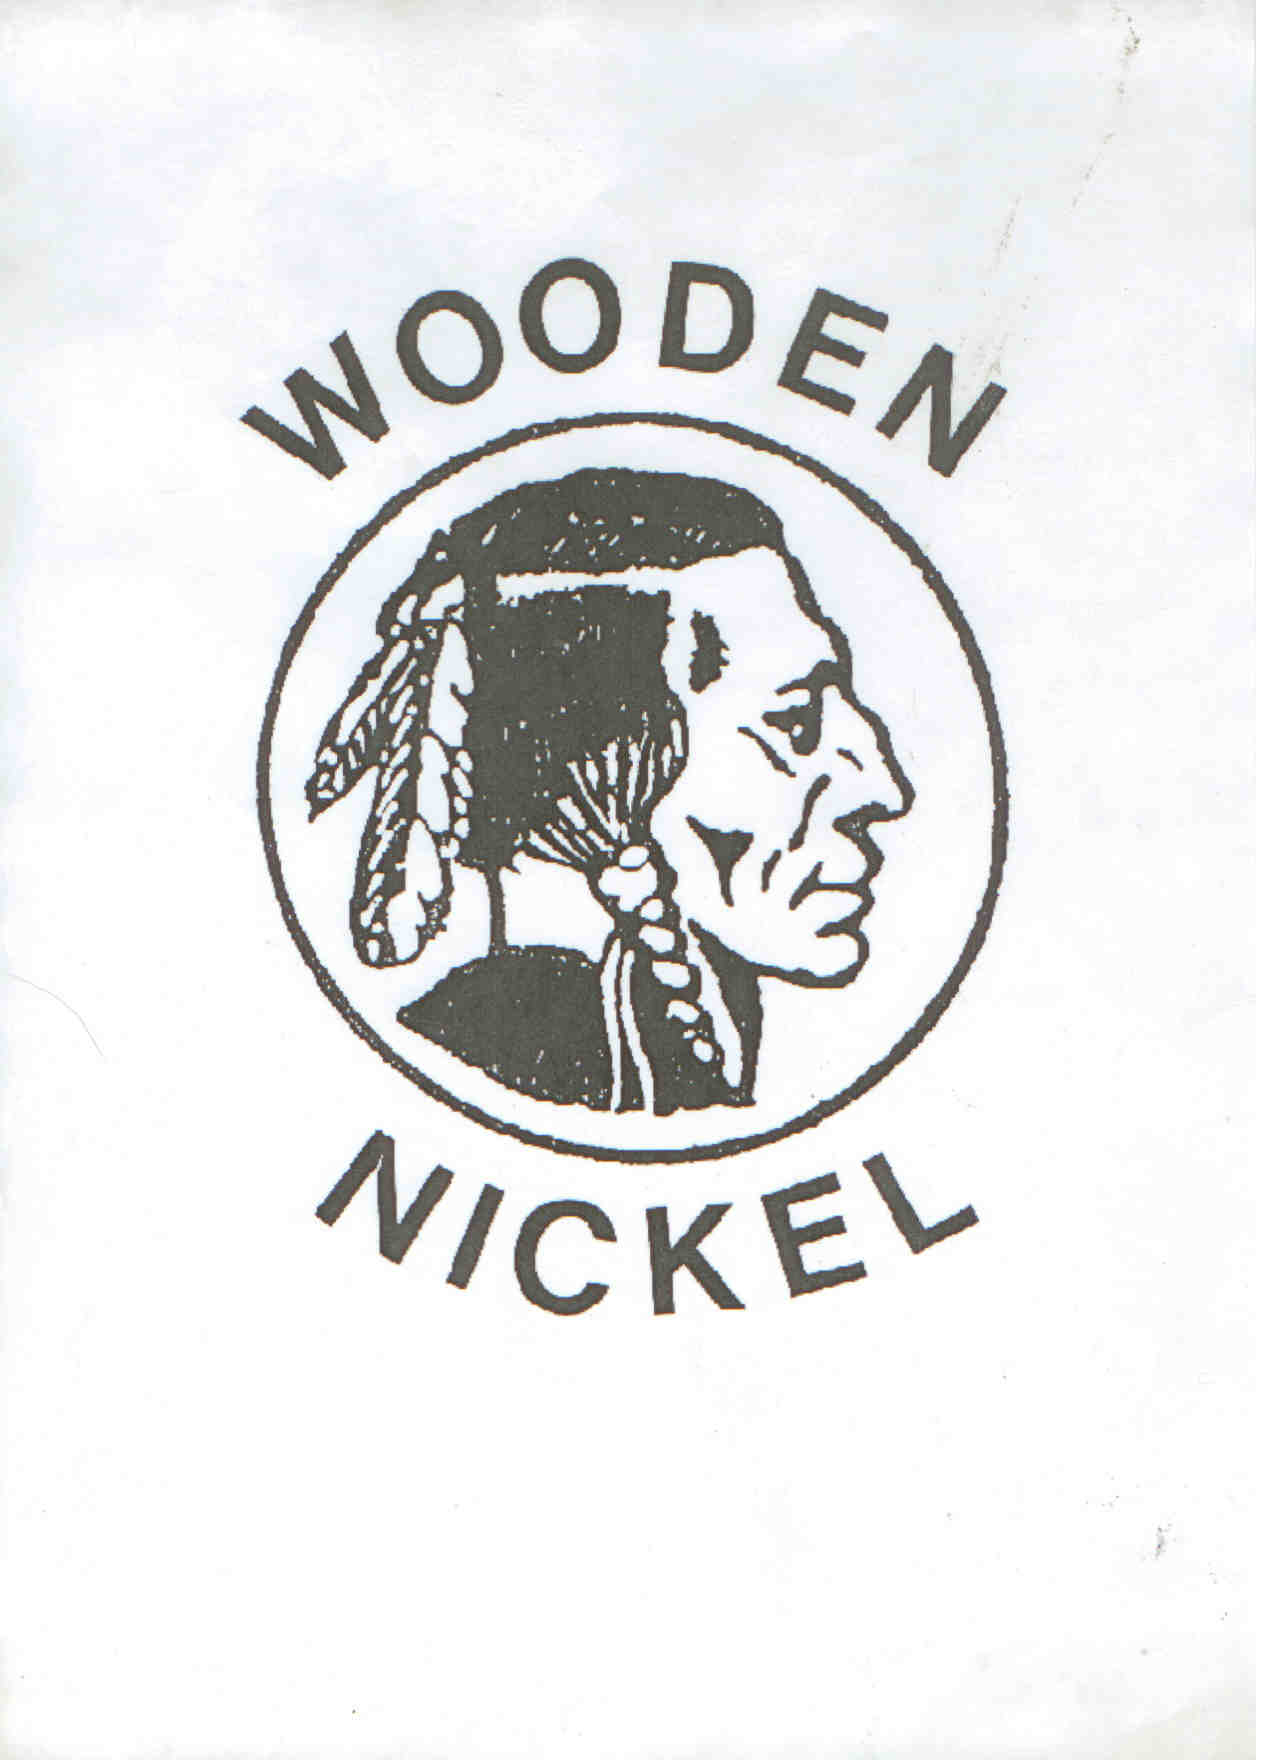 Wooden Nickel Logo